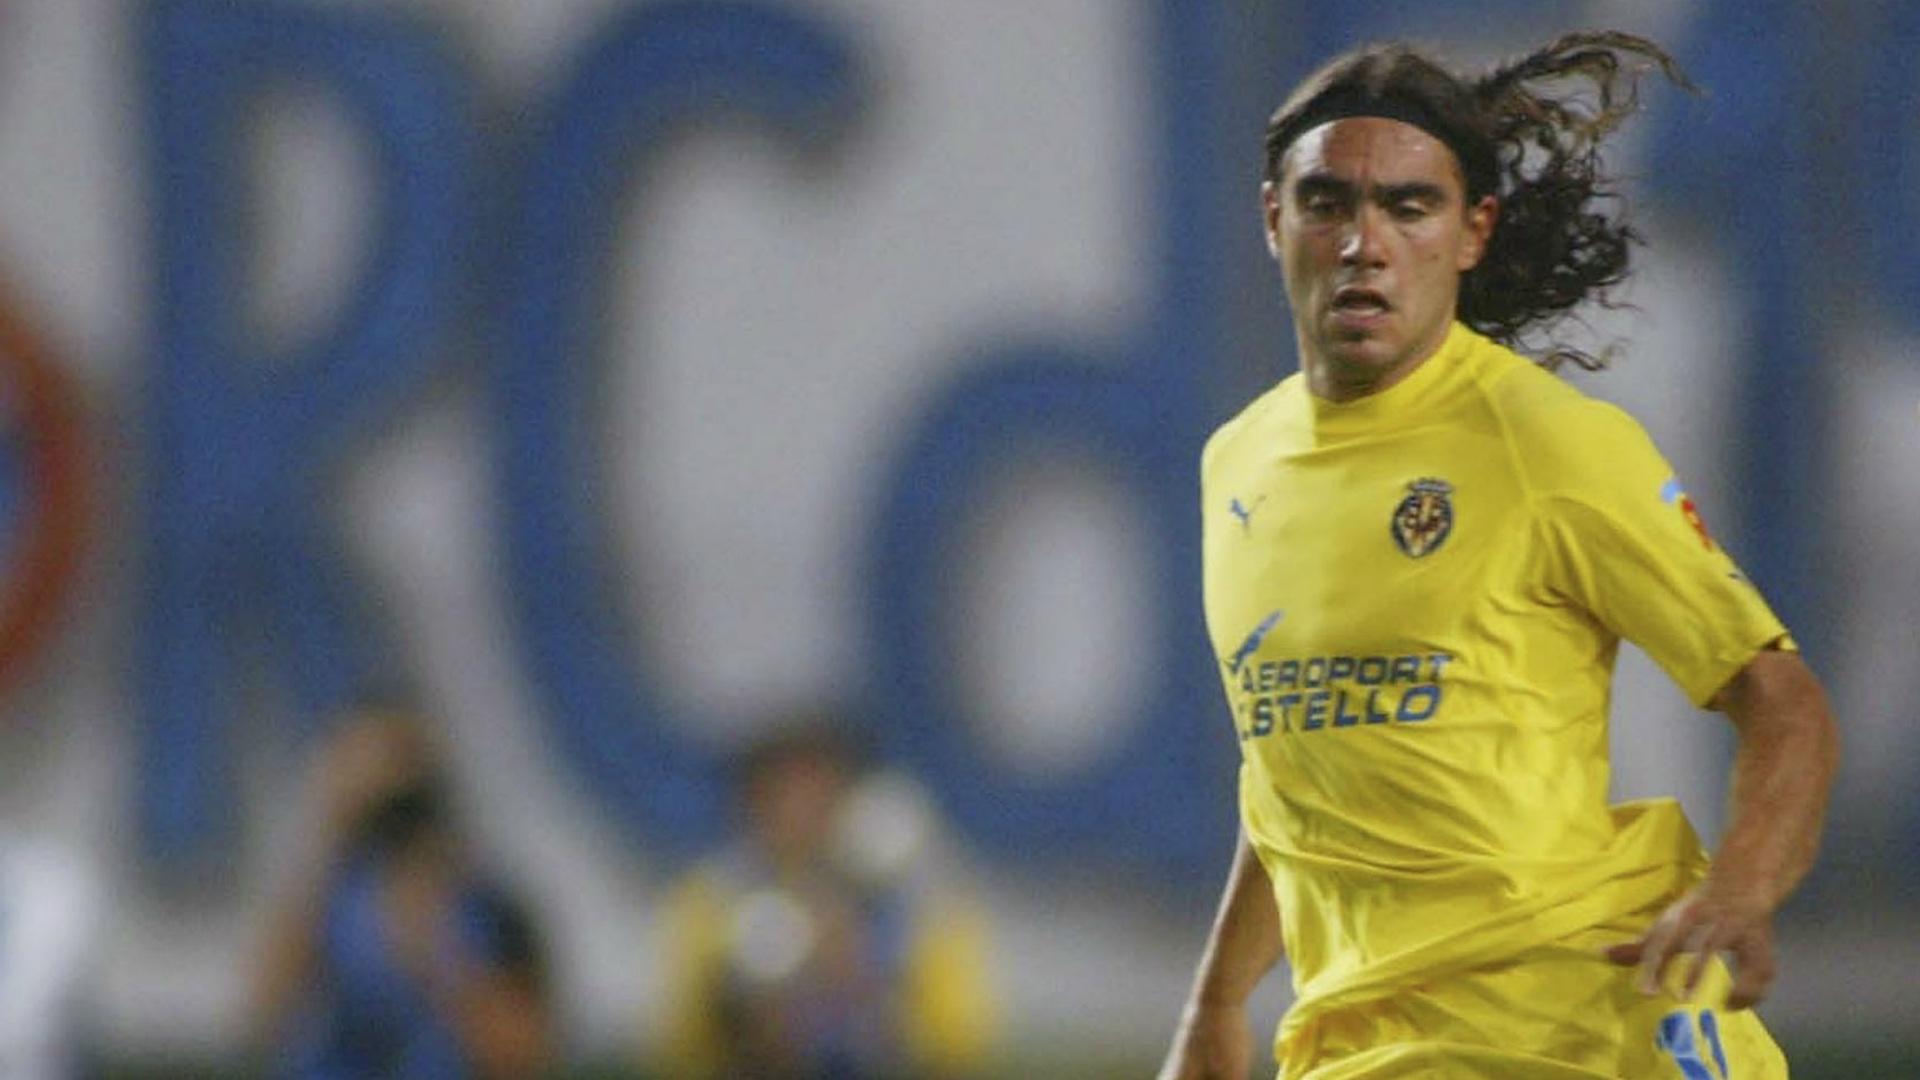 Sorin ex Barcelona player